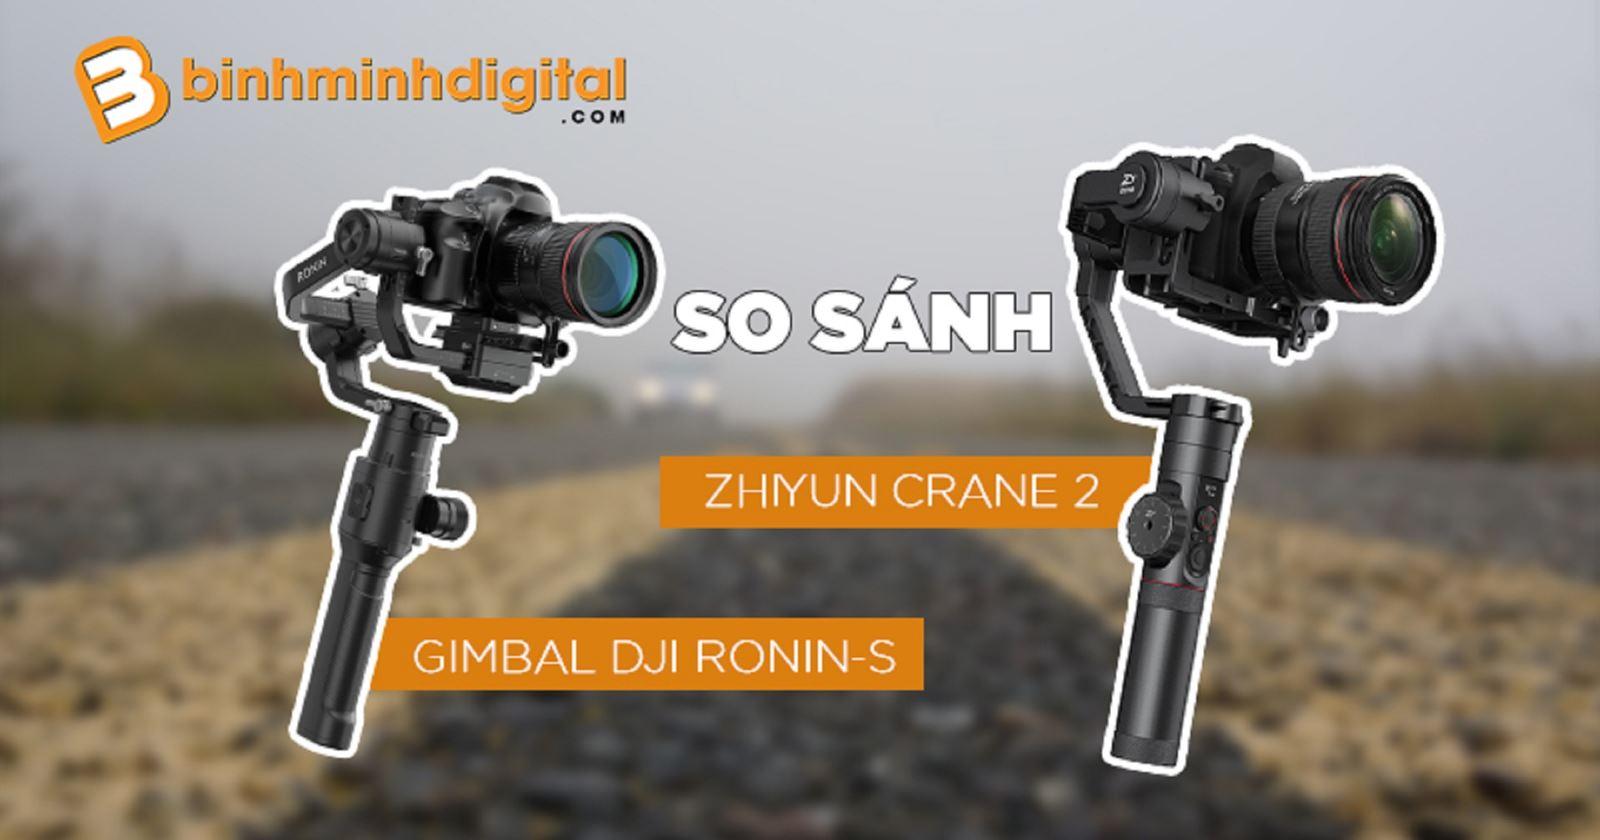 So sánh Gimbal DJI Ronin-S vsZhiyun Crane 2